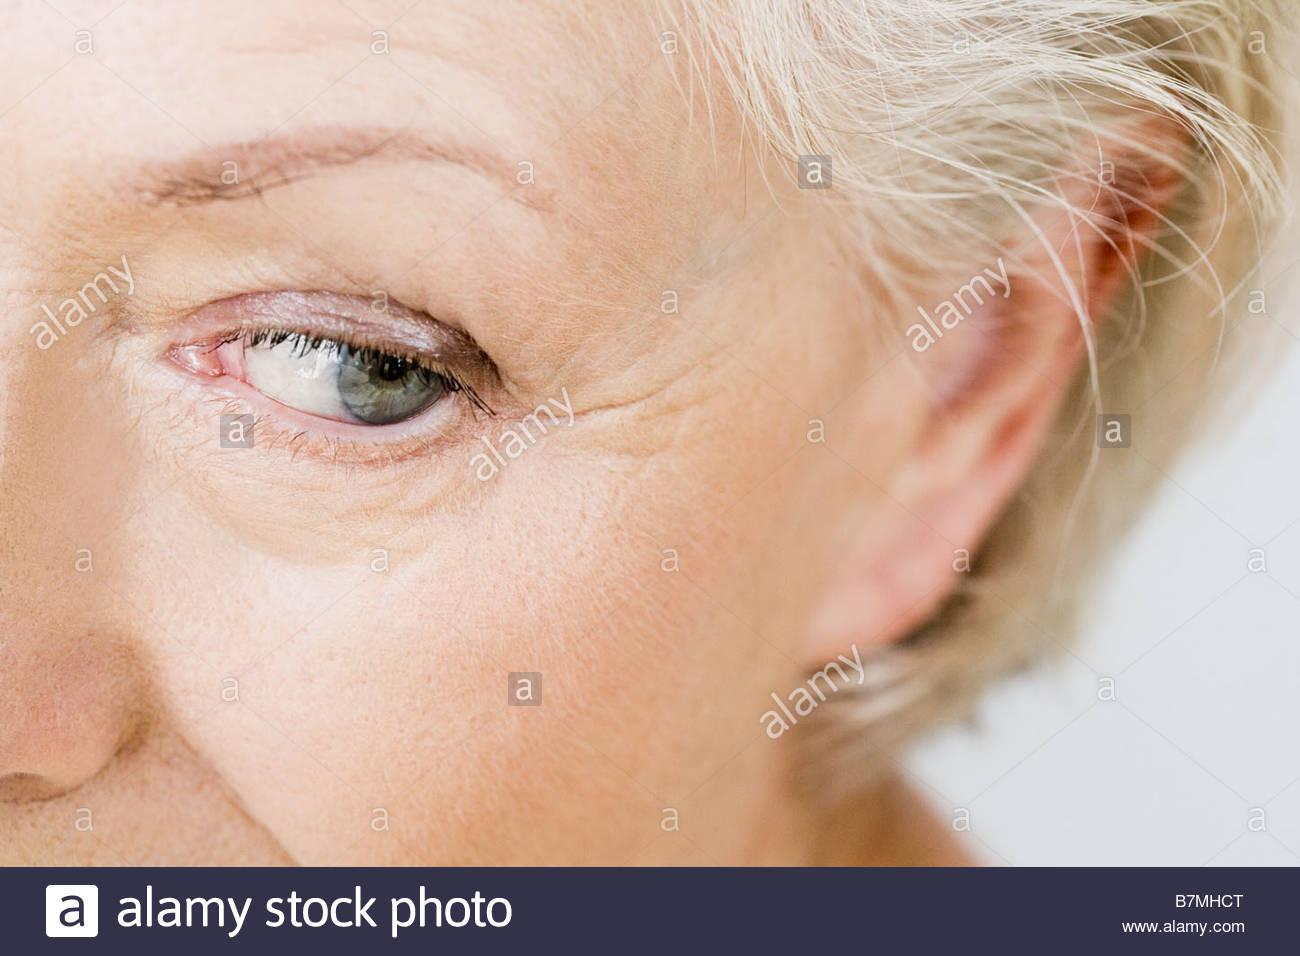 A portrait of a senior woman, detail of eye - Stock Image